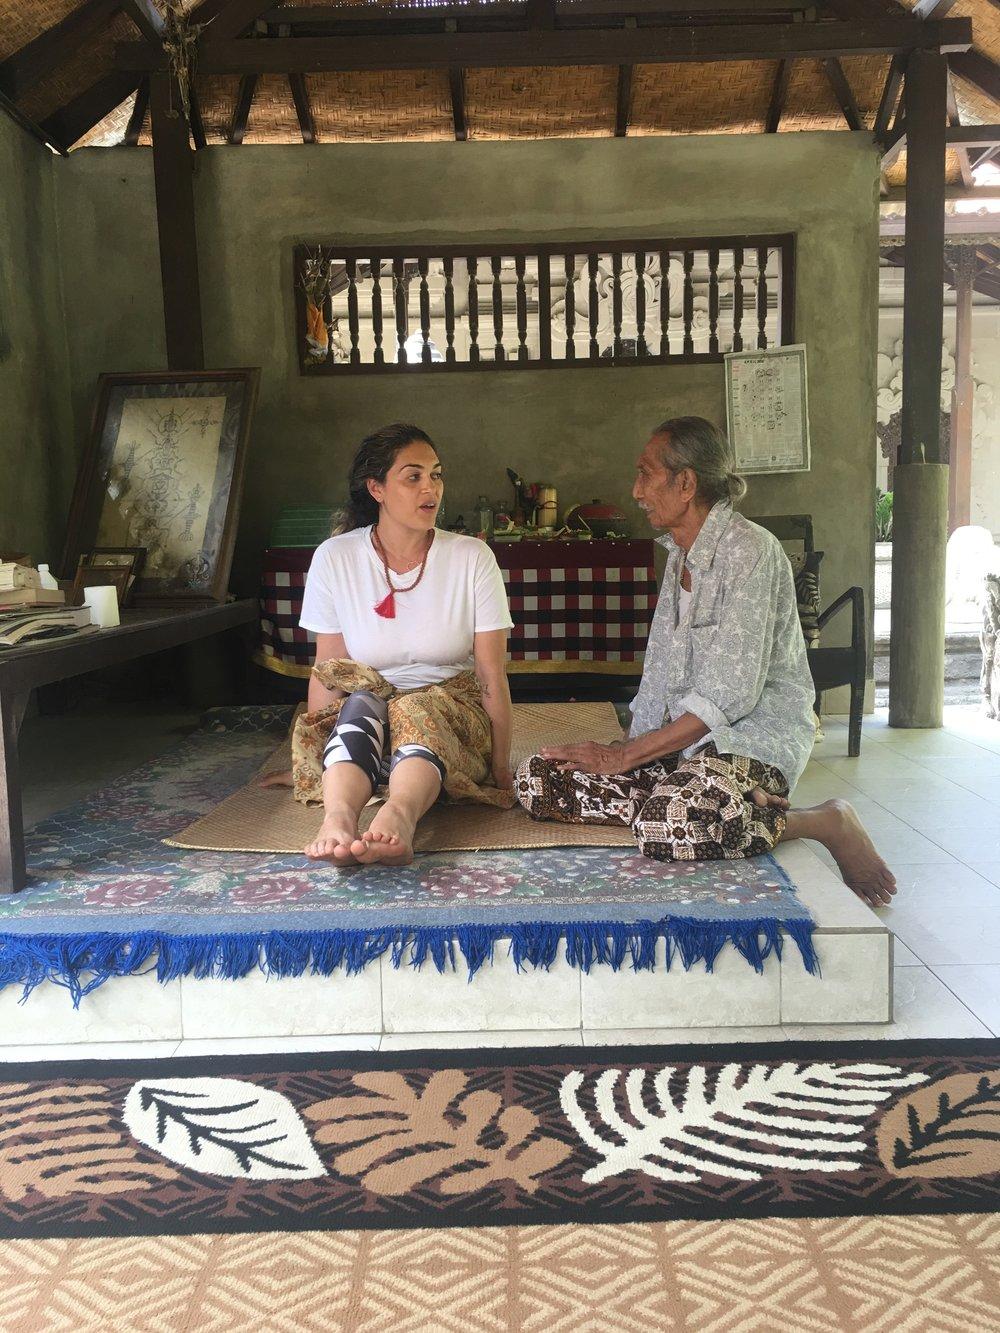 A visit to Tjakorda Rai (or Cokorda Rai). A 90 year old Balinese healer.